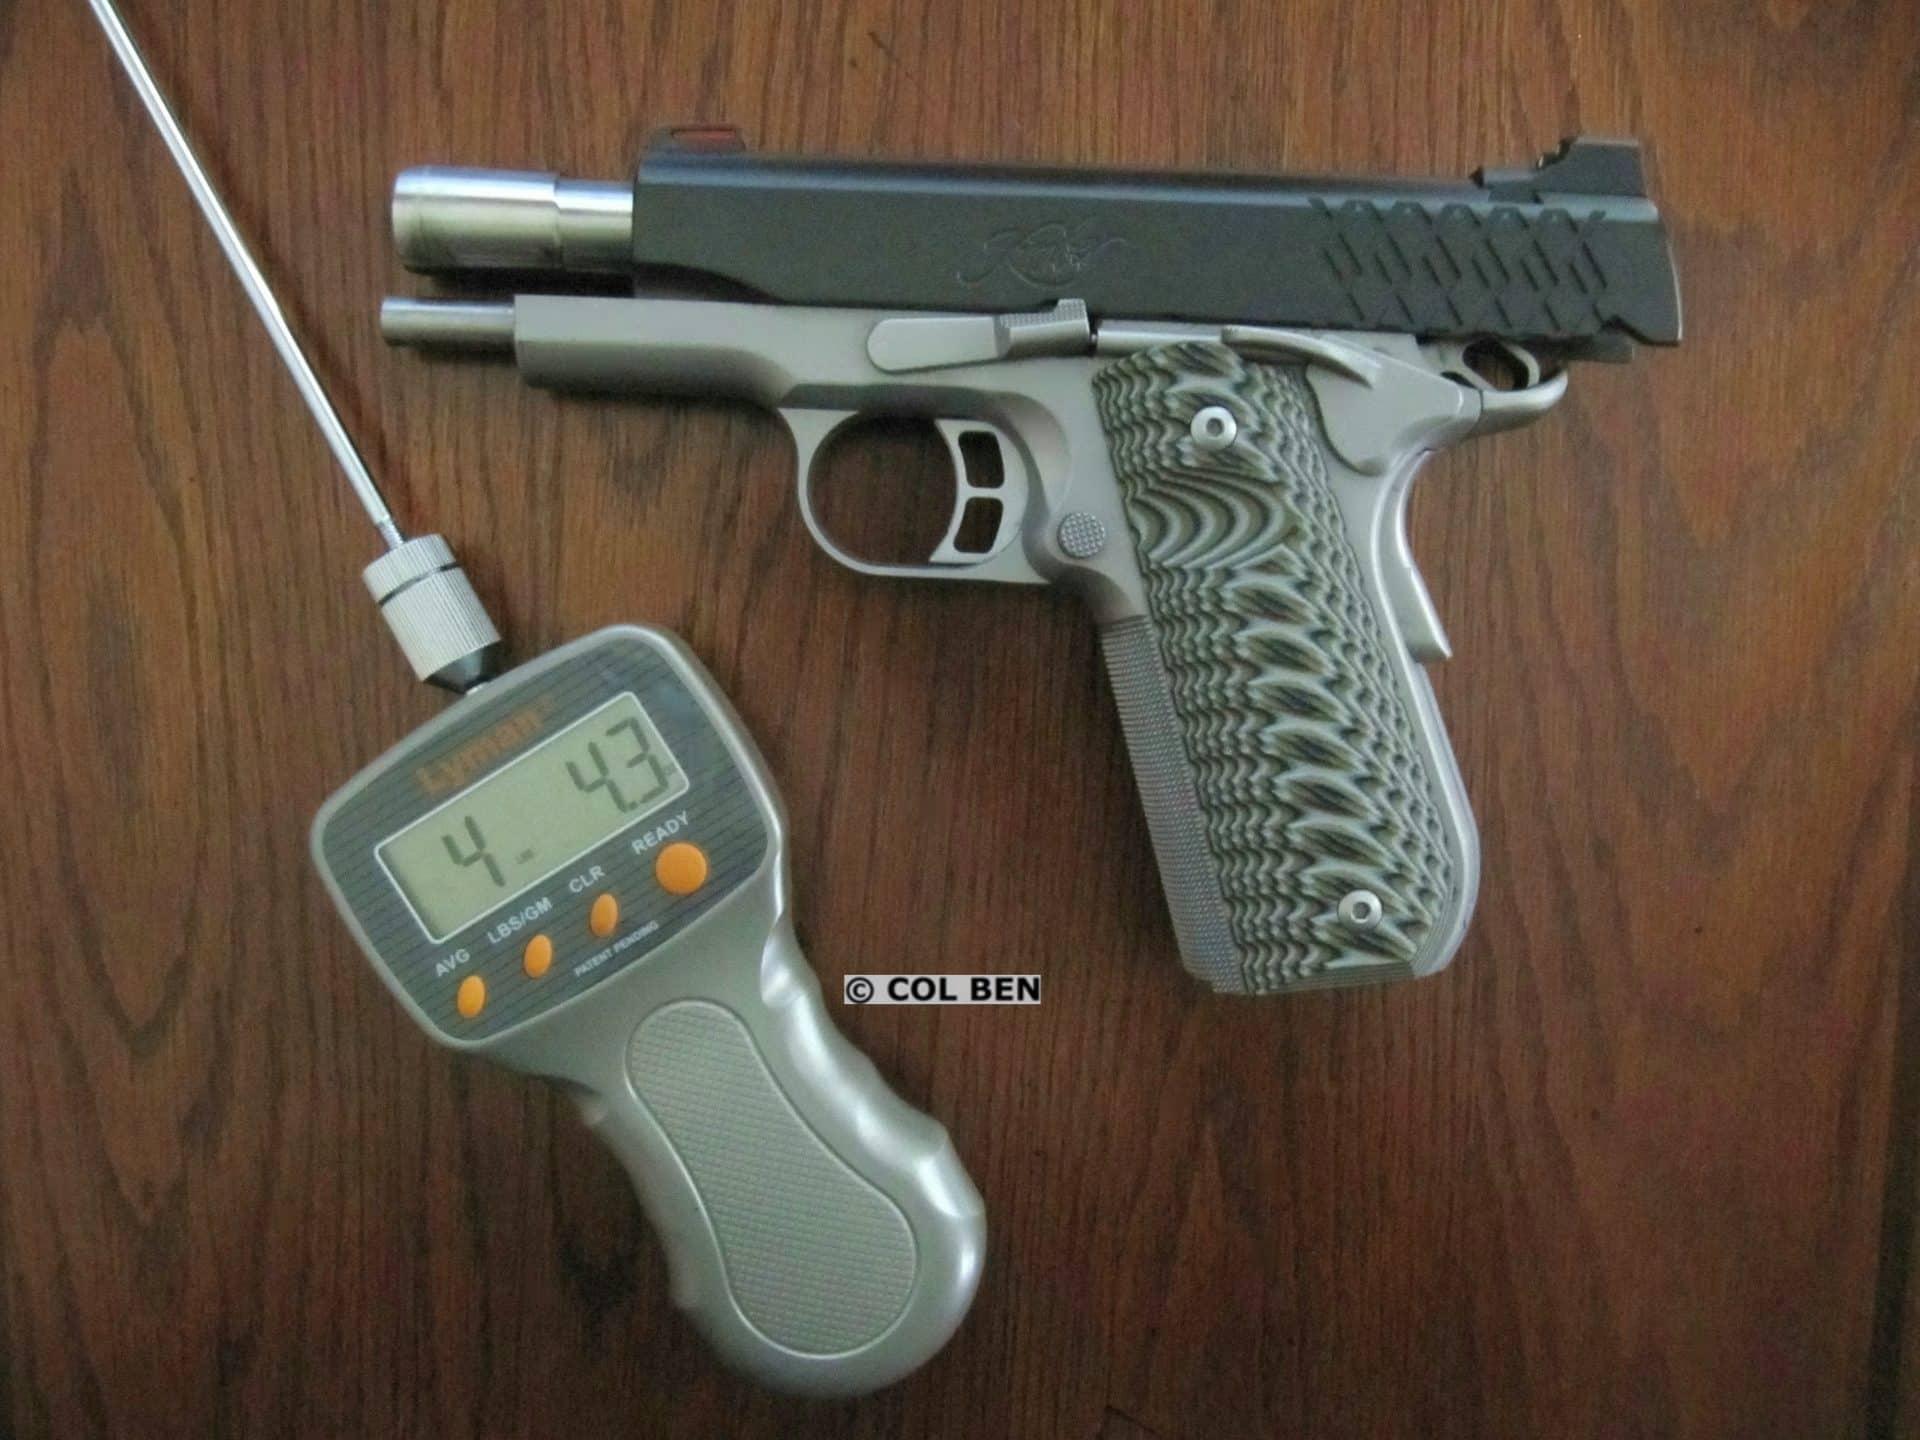 Kimber Aegis Elite Pro 9mm Compact 1911 Review - USA Carry